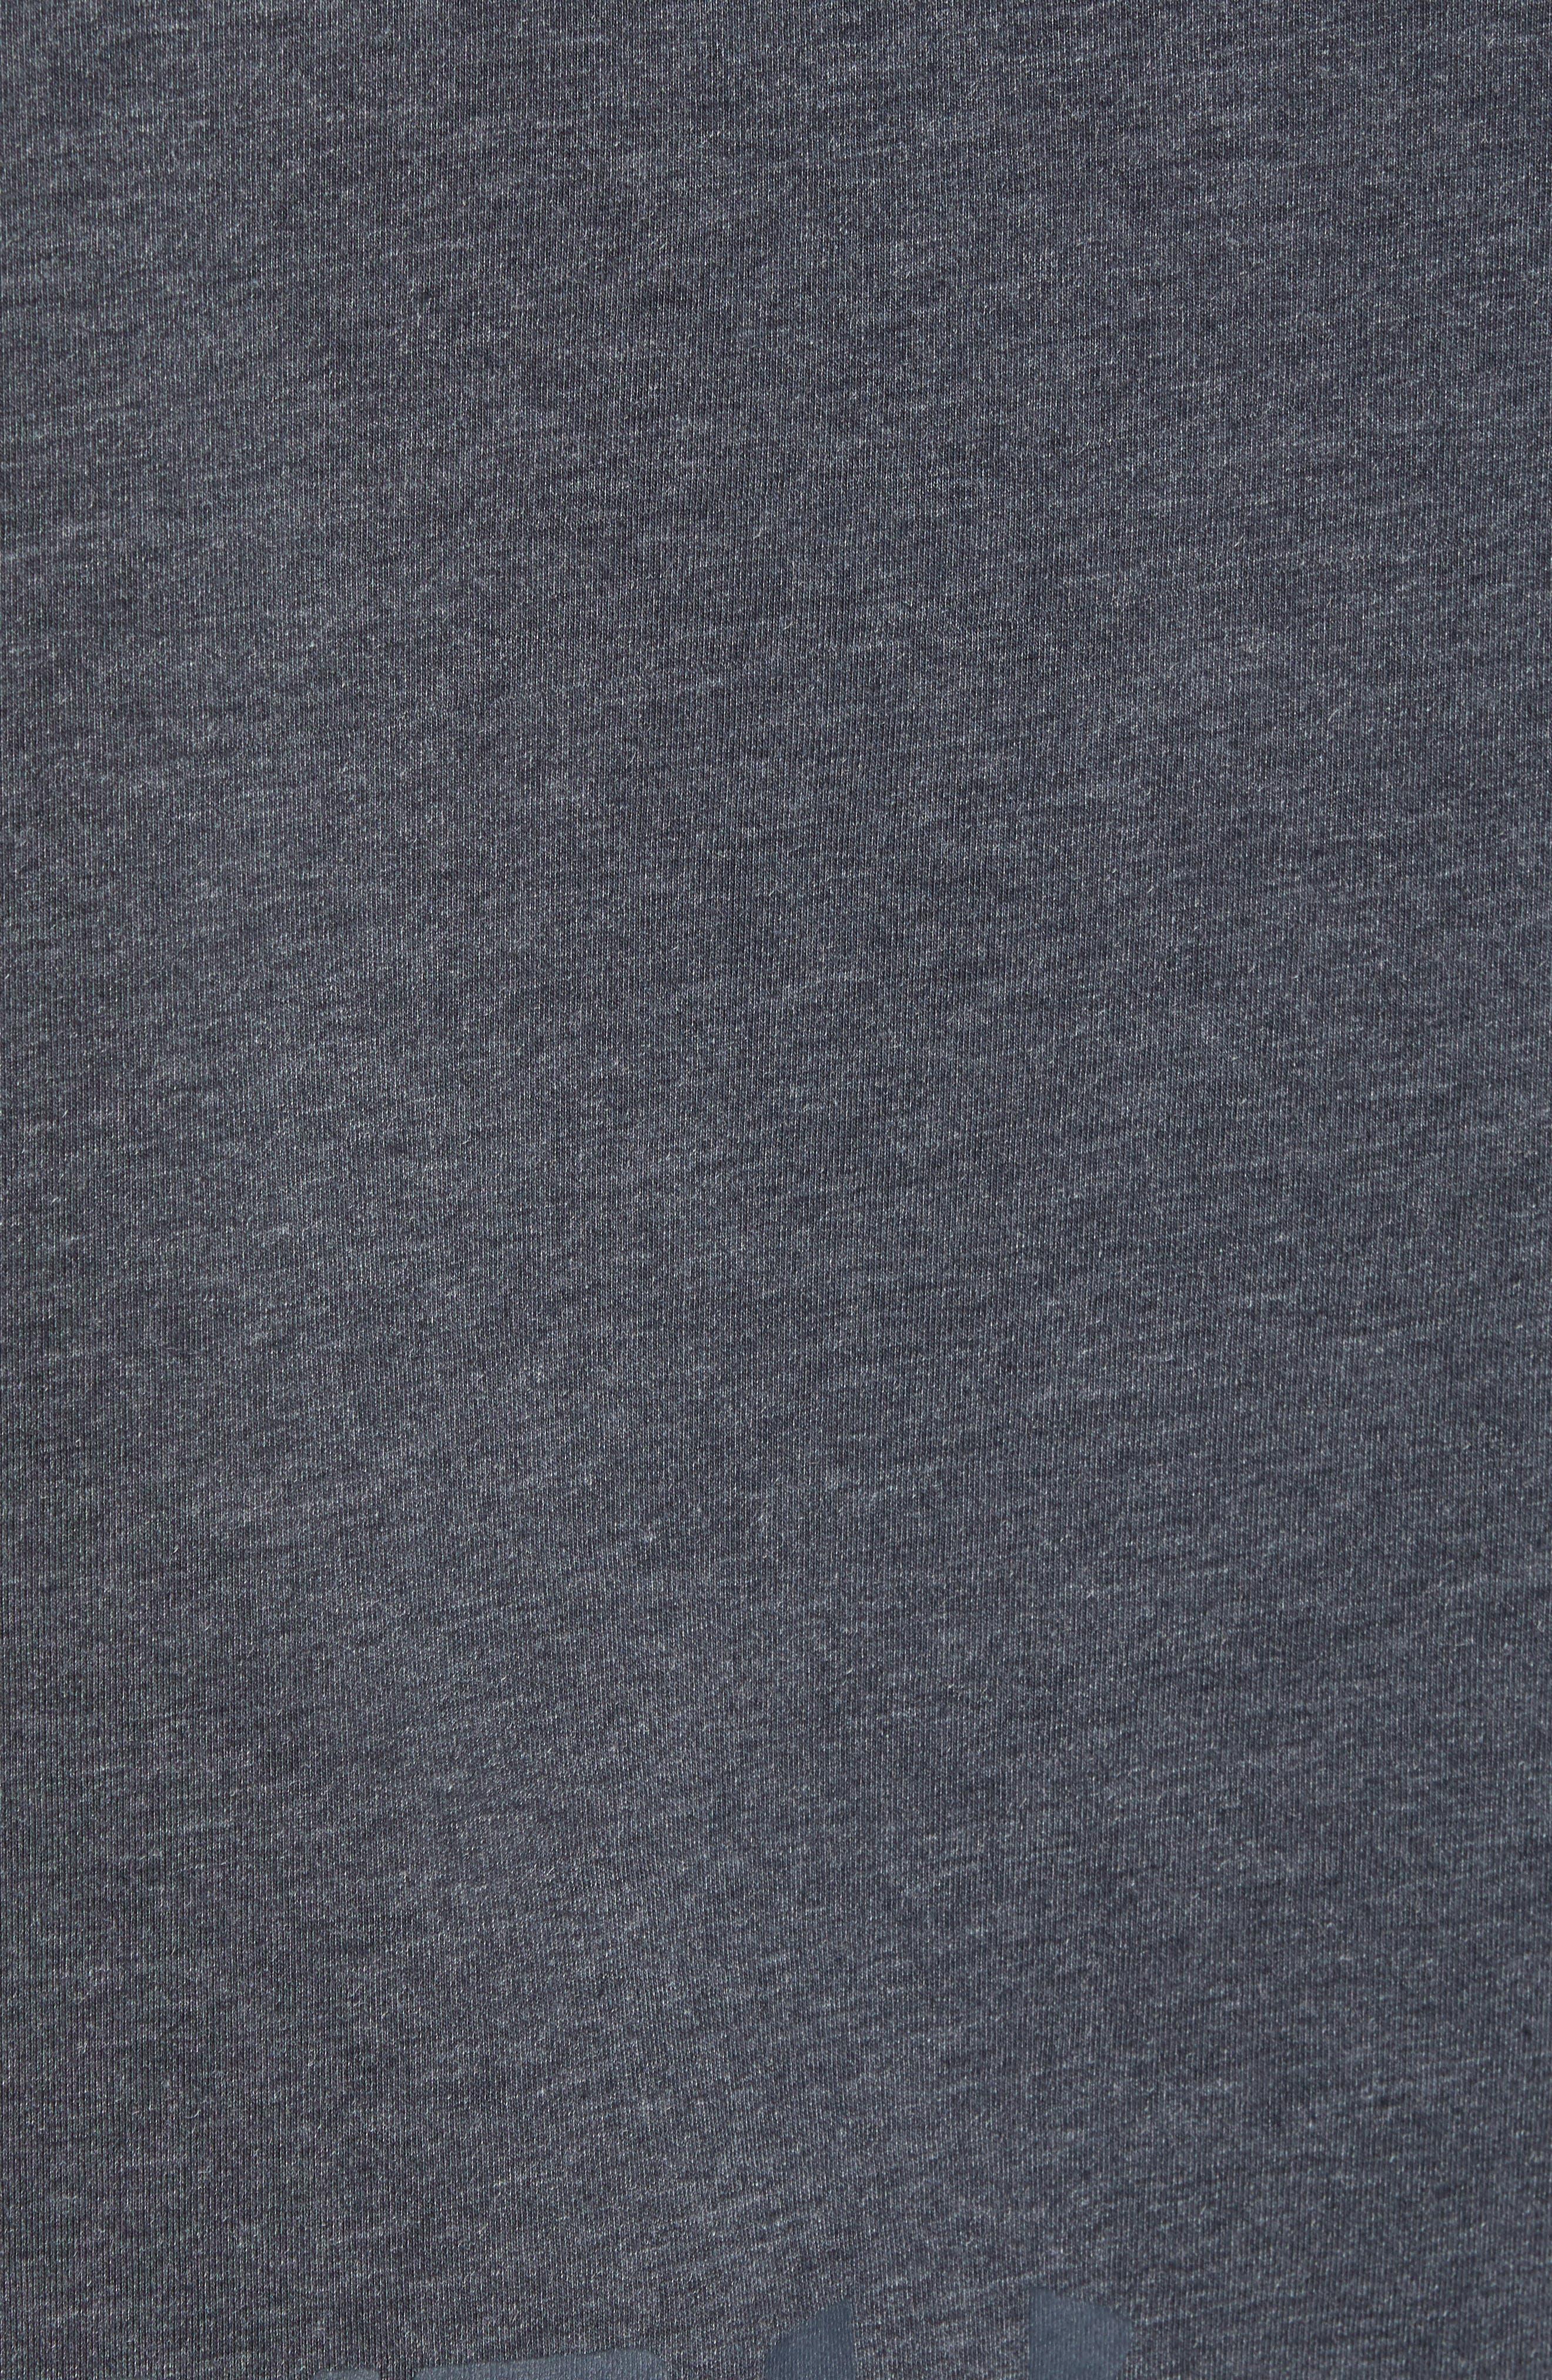 Pursuit Short Sleeve Hoodie,                             Alternate thumbnail 5, color,                             Black/ Black/ Stealth Gray